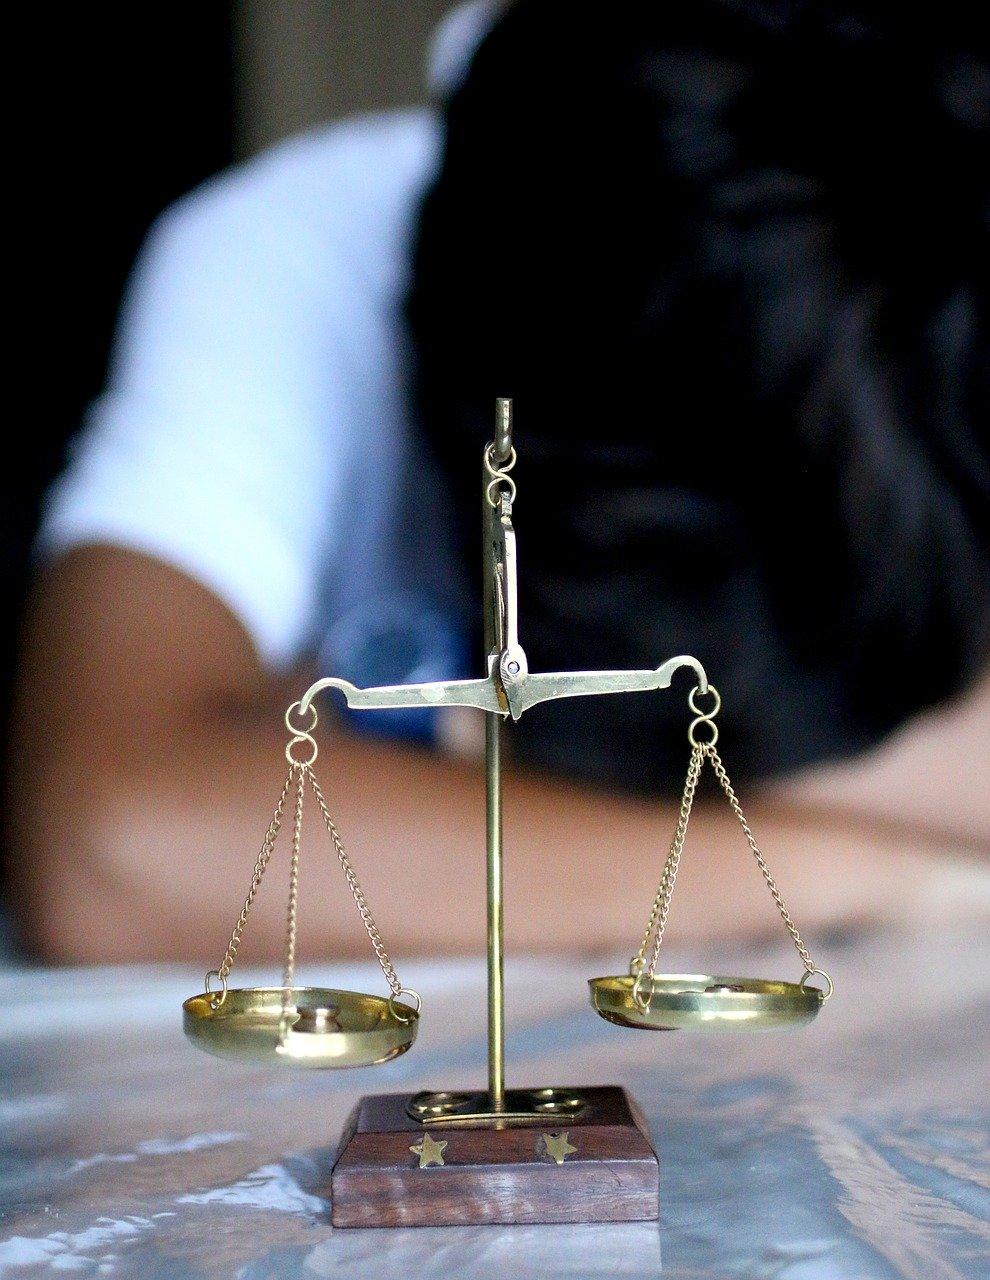 justice-4100373_1280